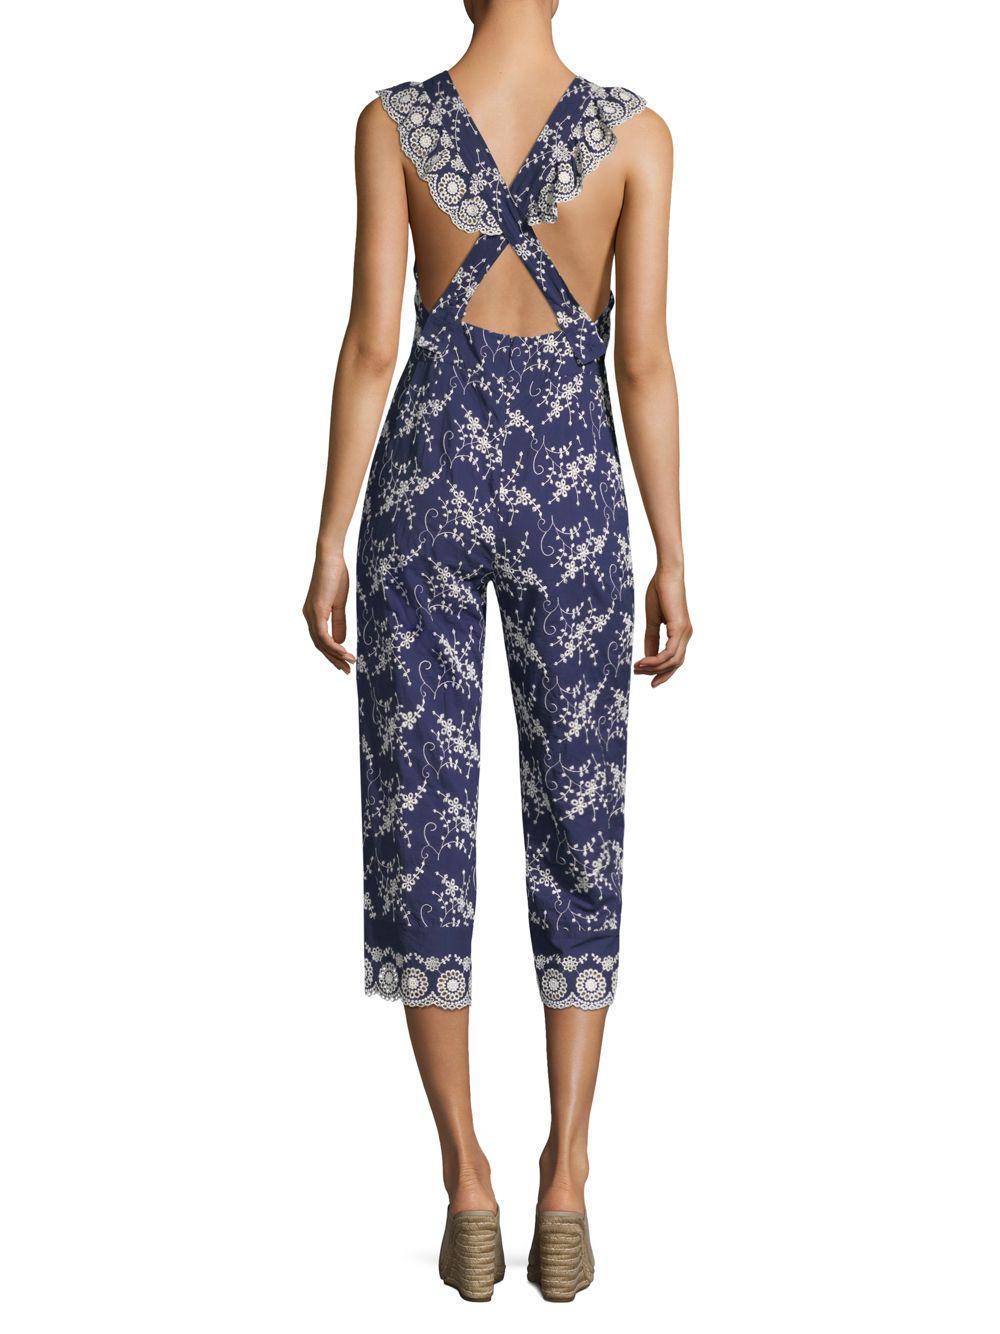 d28f78e1cad Nightcap Olive Lace Apron Jumpsuit in Blue - Save 15.26717557251908 ...